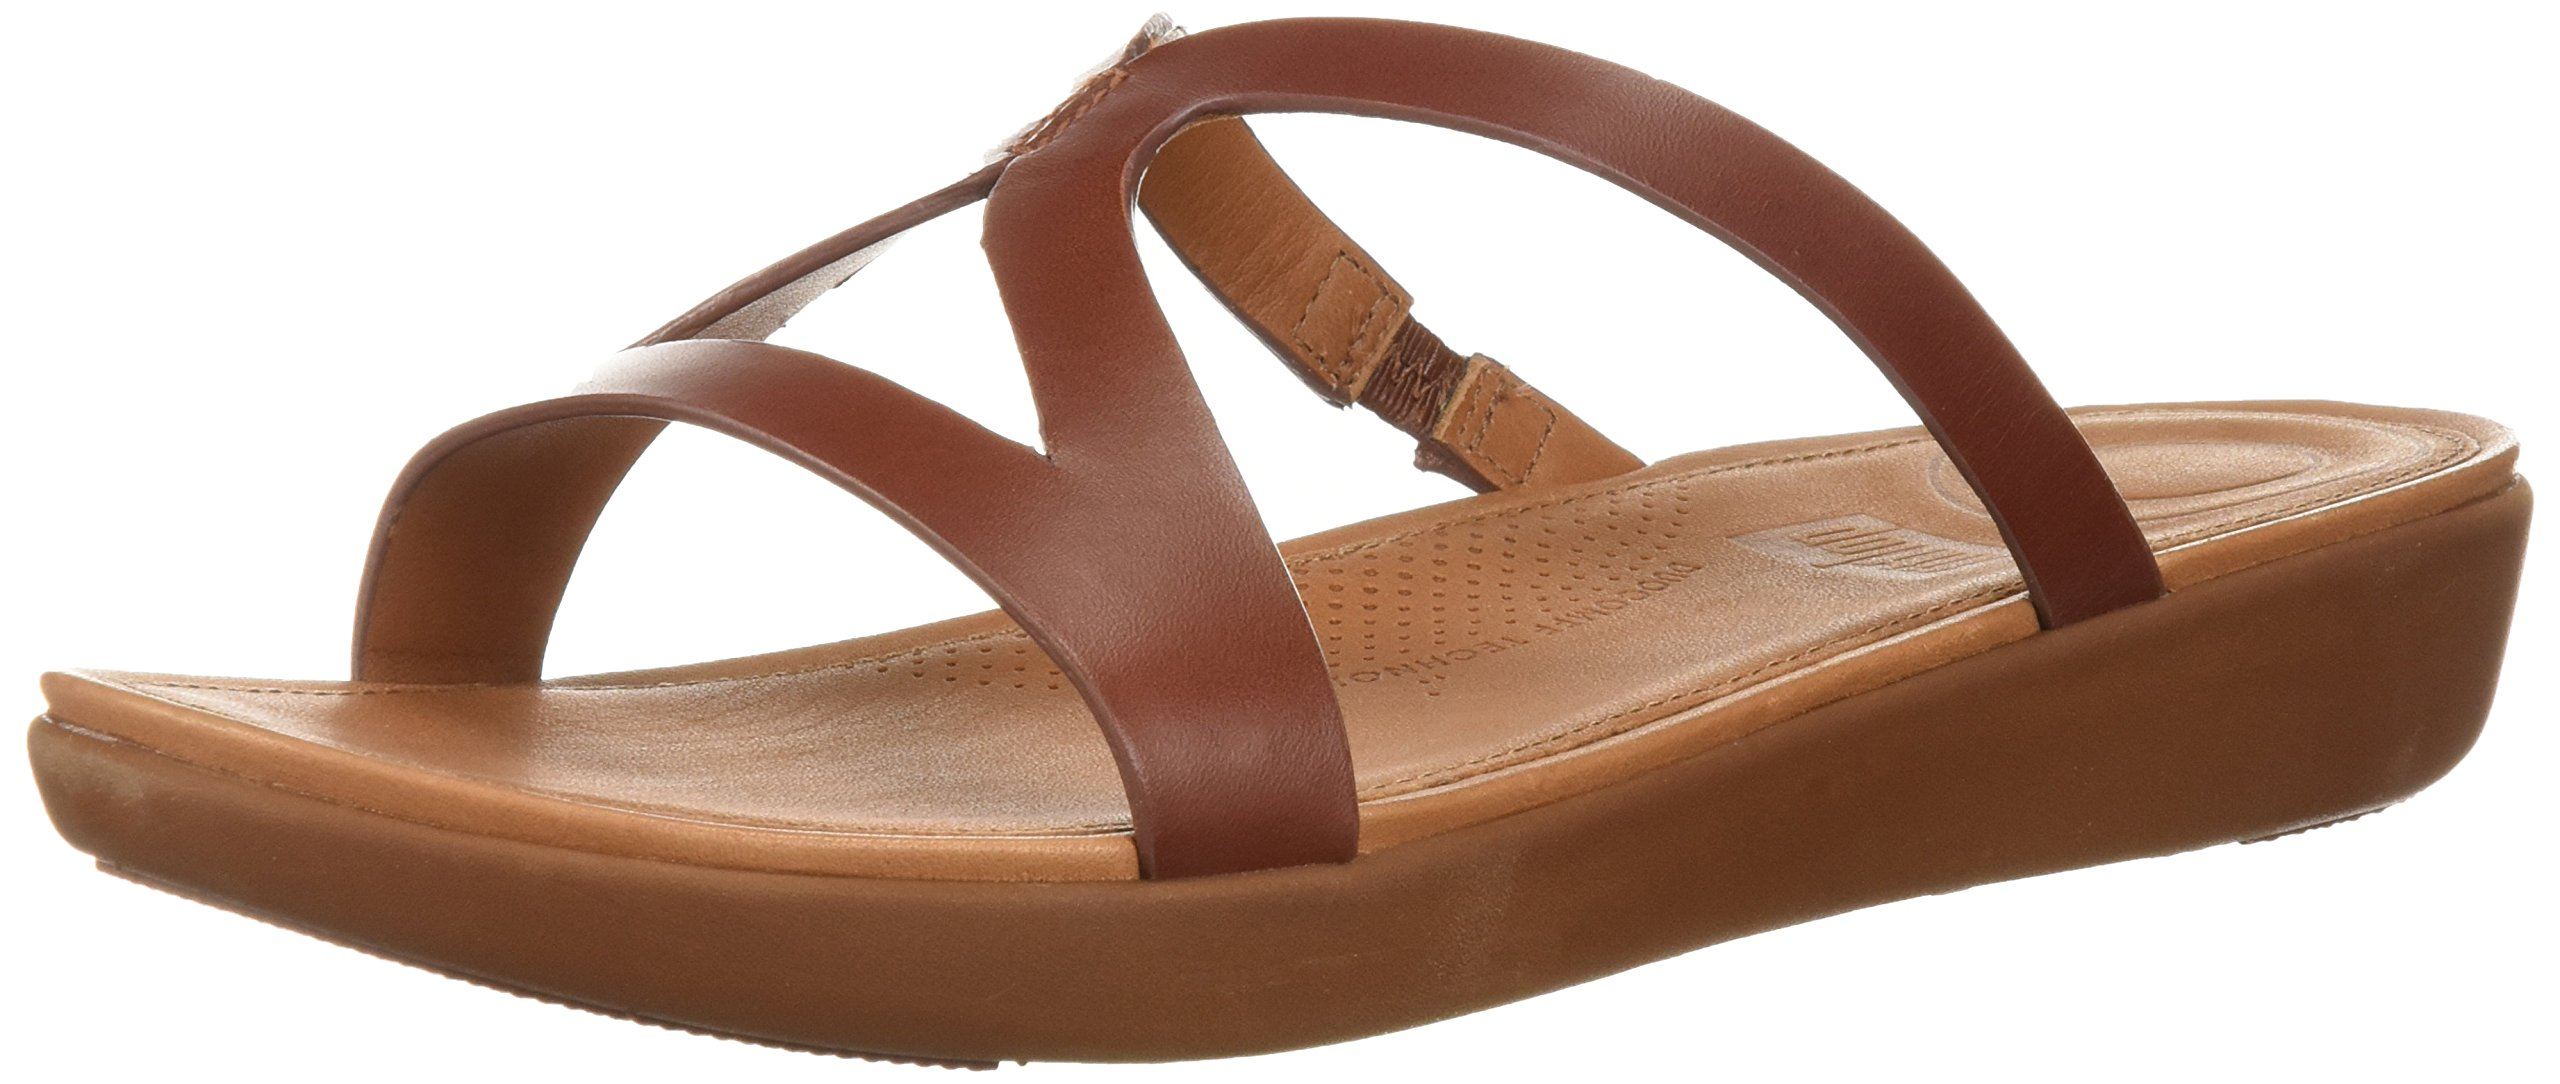 FitFlop Women's Strata Slide Sandal, Cognac, 7 M US